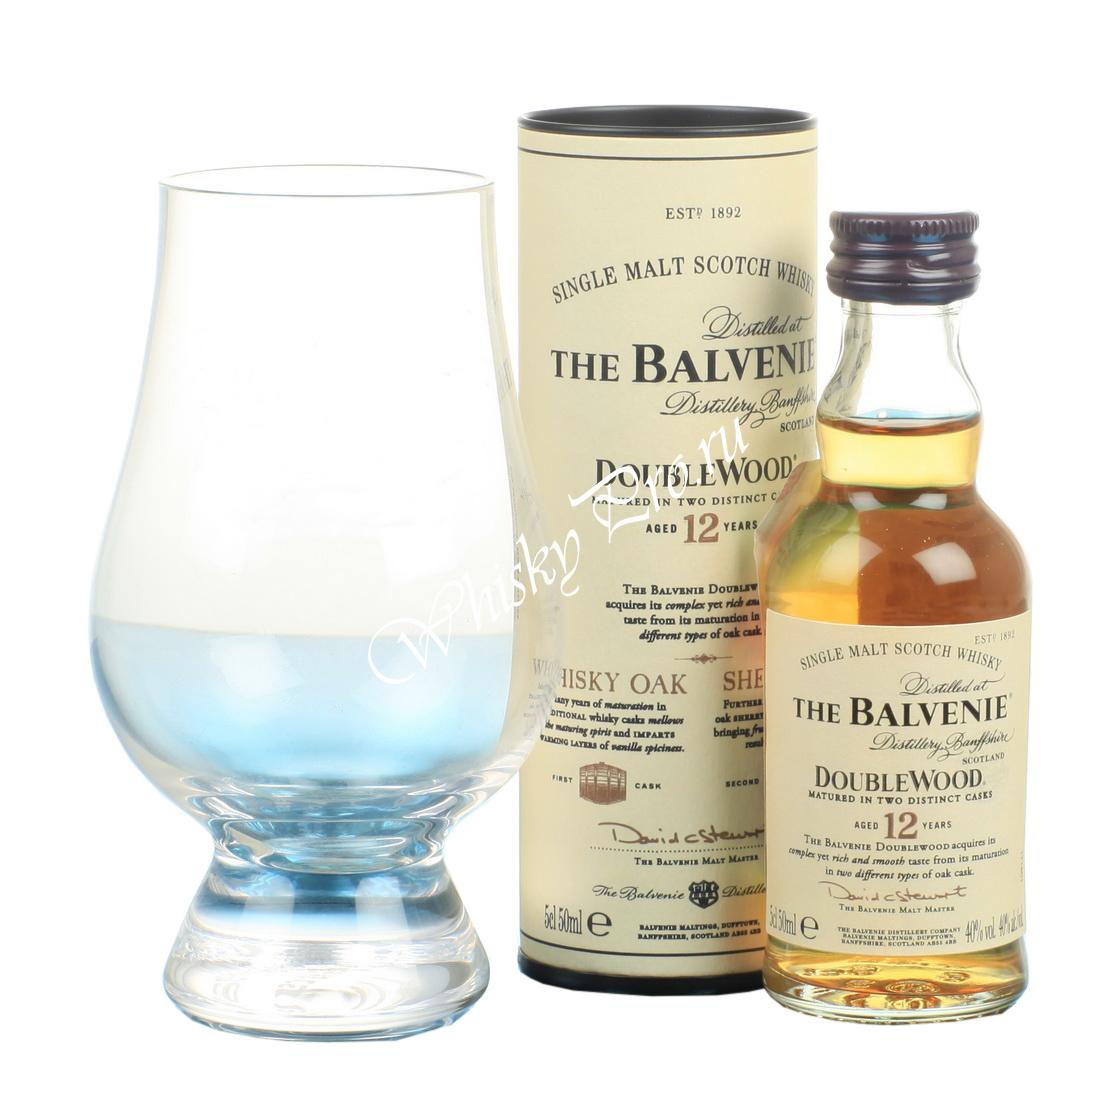 Balvenie Doublewood 12 YO 0.05l виски Балвэни 12 лет Дабл Вуд 0.05л в тубе